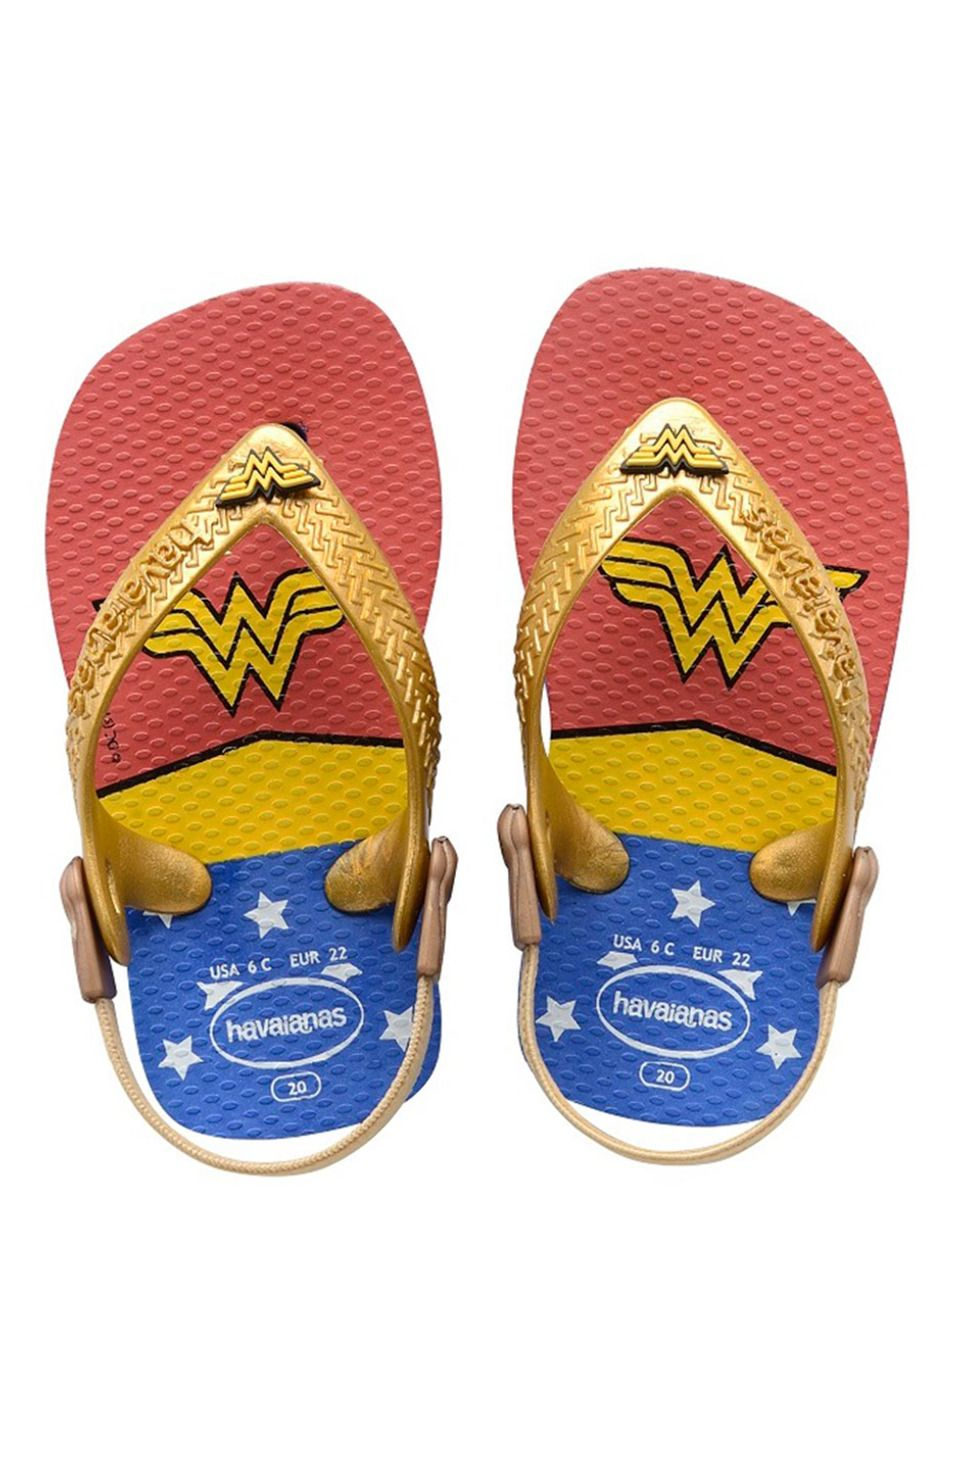 0107cb32565a39 Havaianas - Baby Heroes Flip Flops in Blue Star